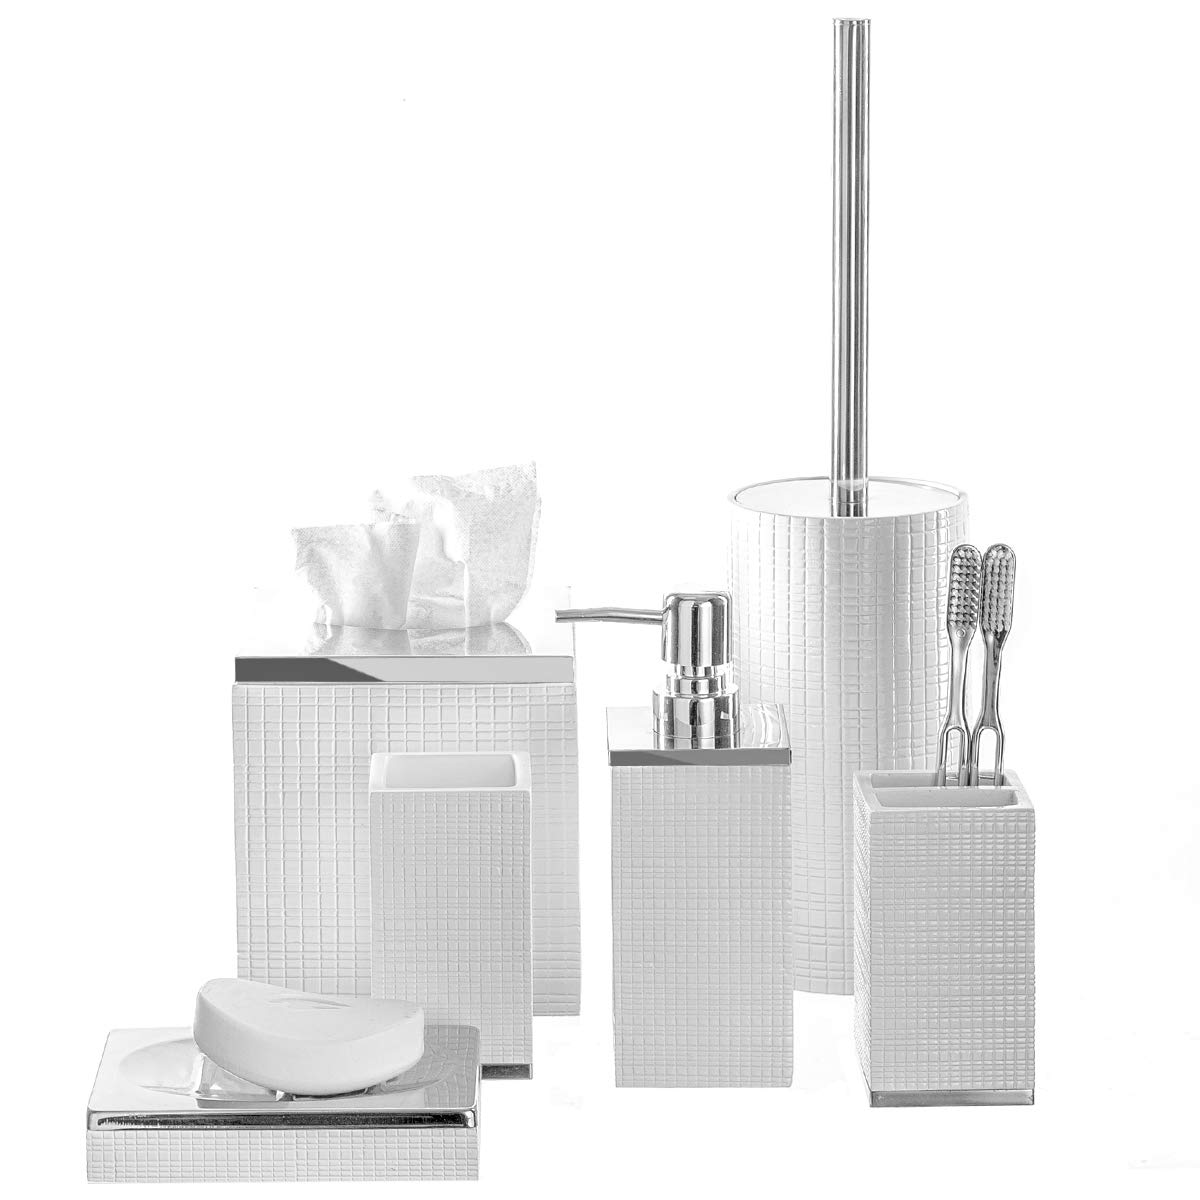 Creative Scents Estella 6-Piece Bathroom Accessories Set, Includes Decorative Countertop Soap Dispenser, Soap Dish, Tumbler, Toothbrush Holder, Tissue Box Cover and Toilet Bowl Brush (White)